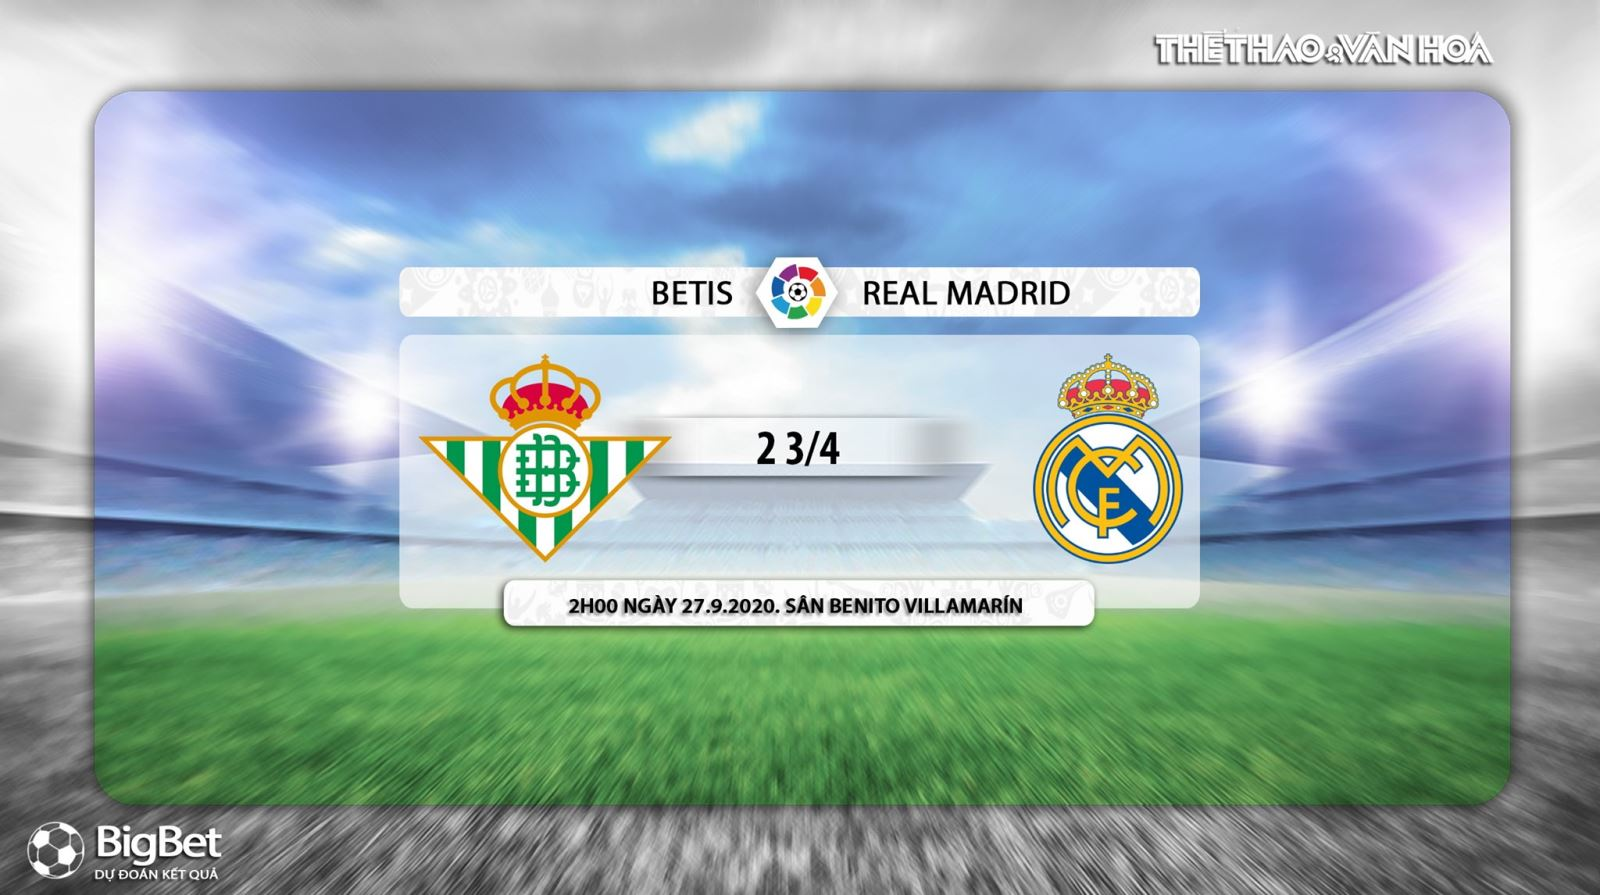 Betis vs Real Madrid, soi kèo Betis vs Real Madrid, Real Betis, nhận định Betis vs Real Madrid, soi kèo bóng đá, nhận định bóng đá